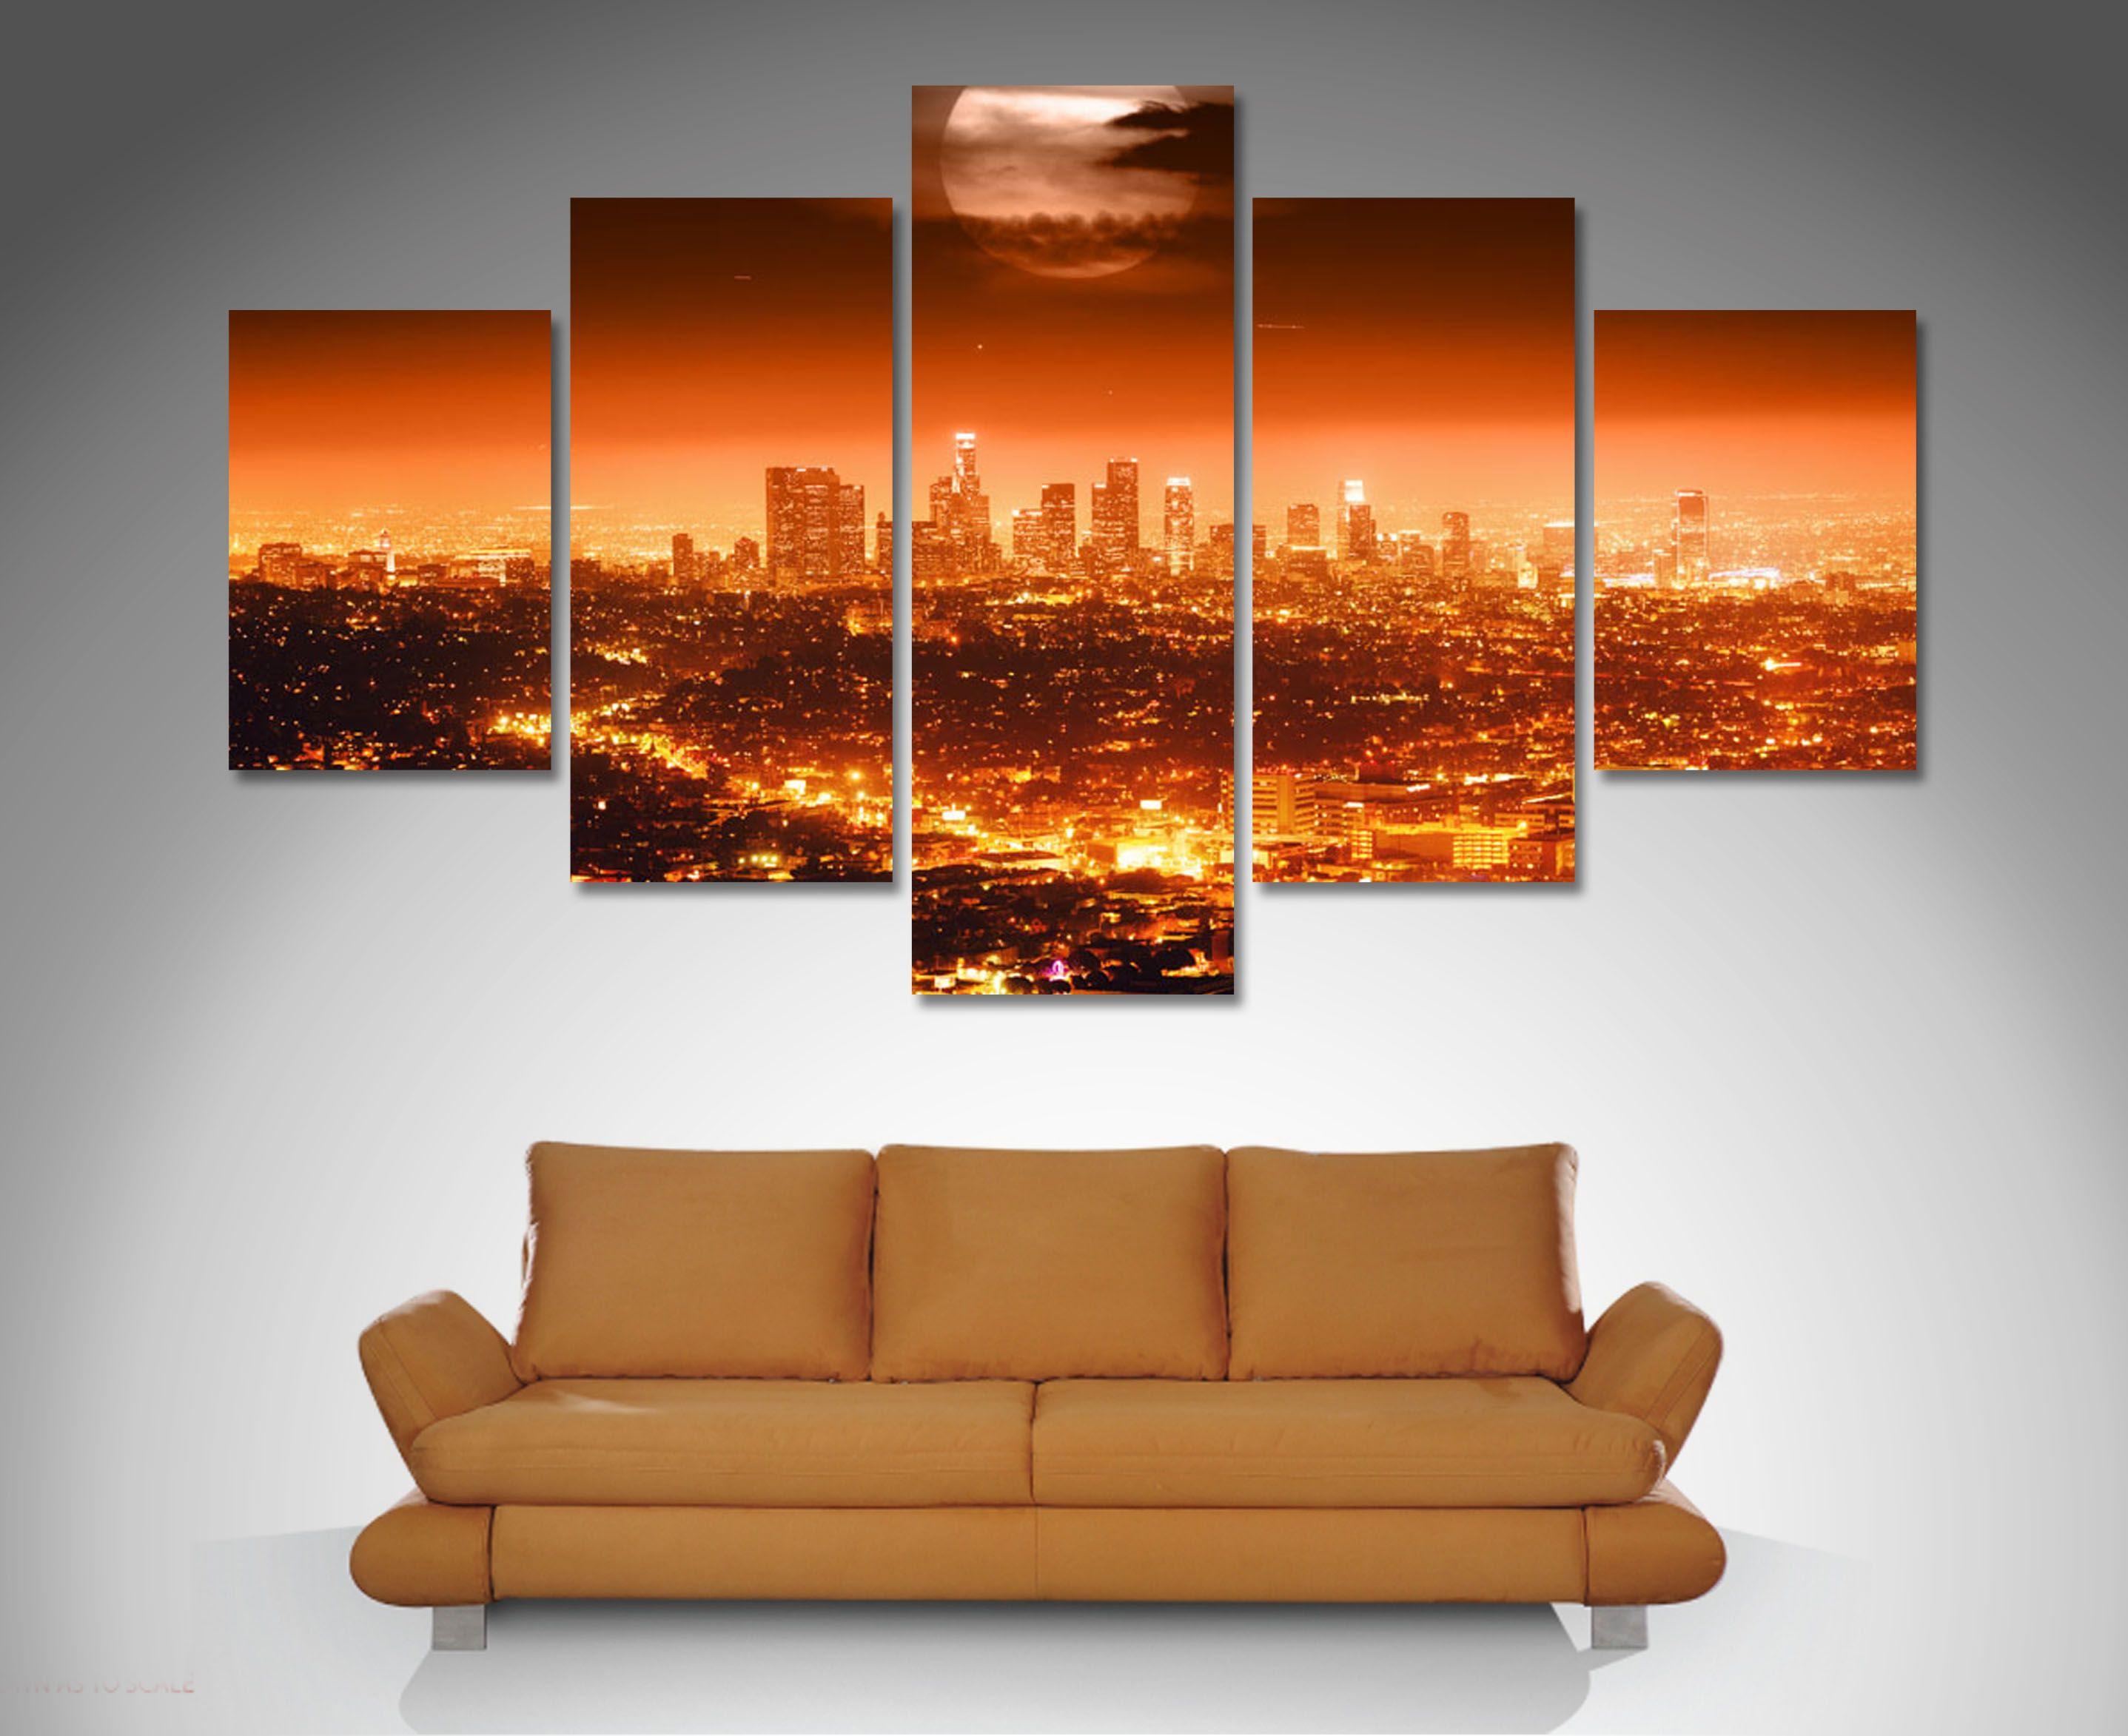 Los Angeles 5 Panel Wall Art Canvas Prints 5 Panel Wall